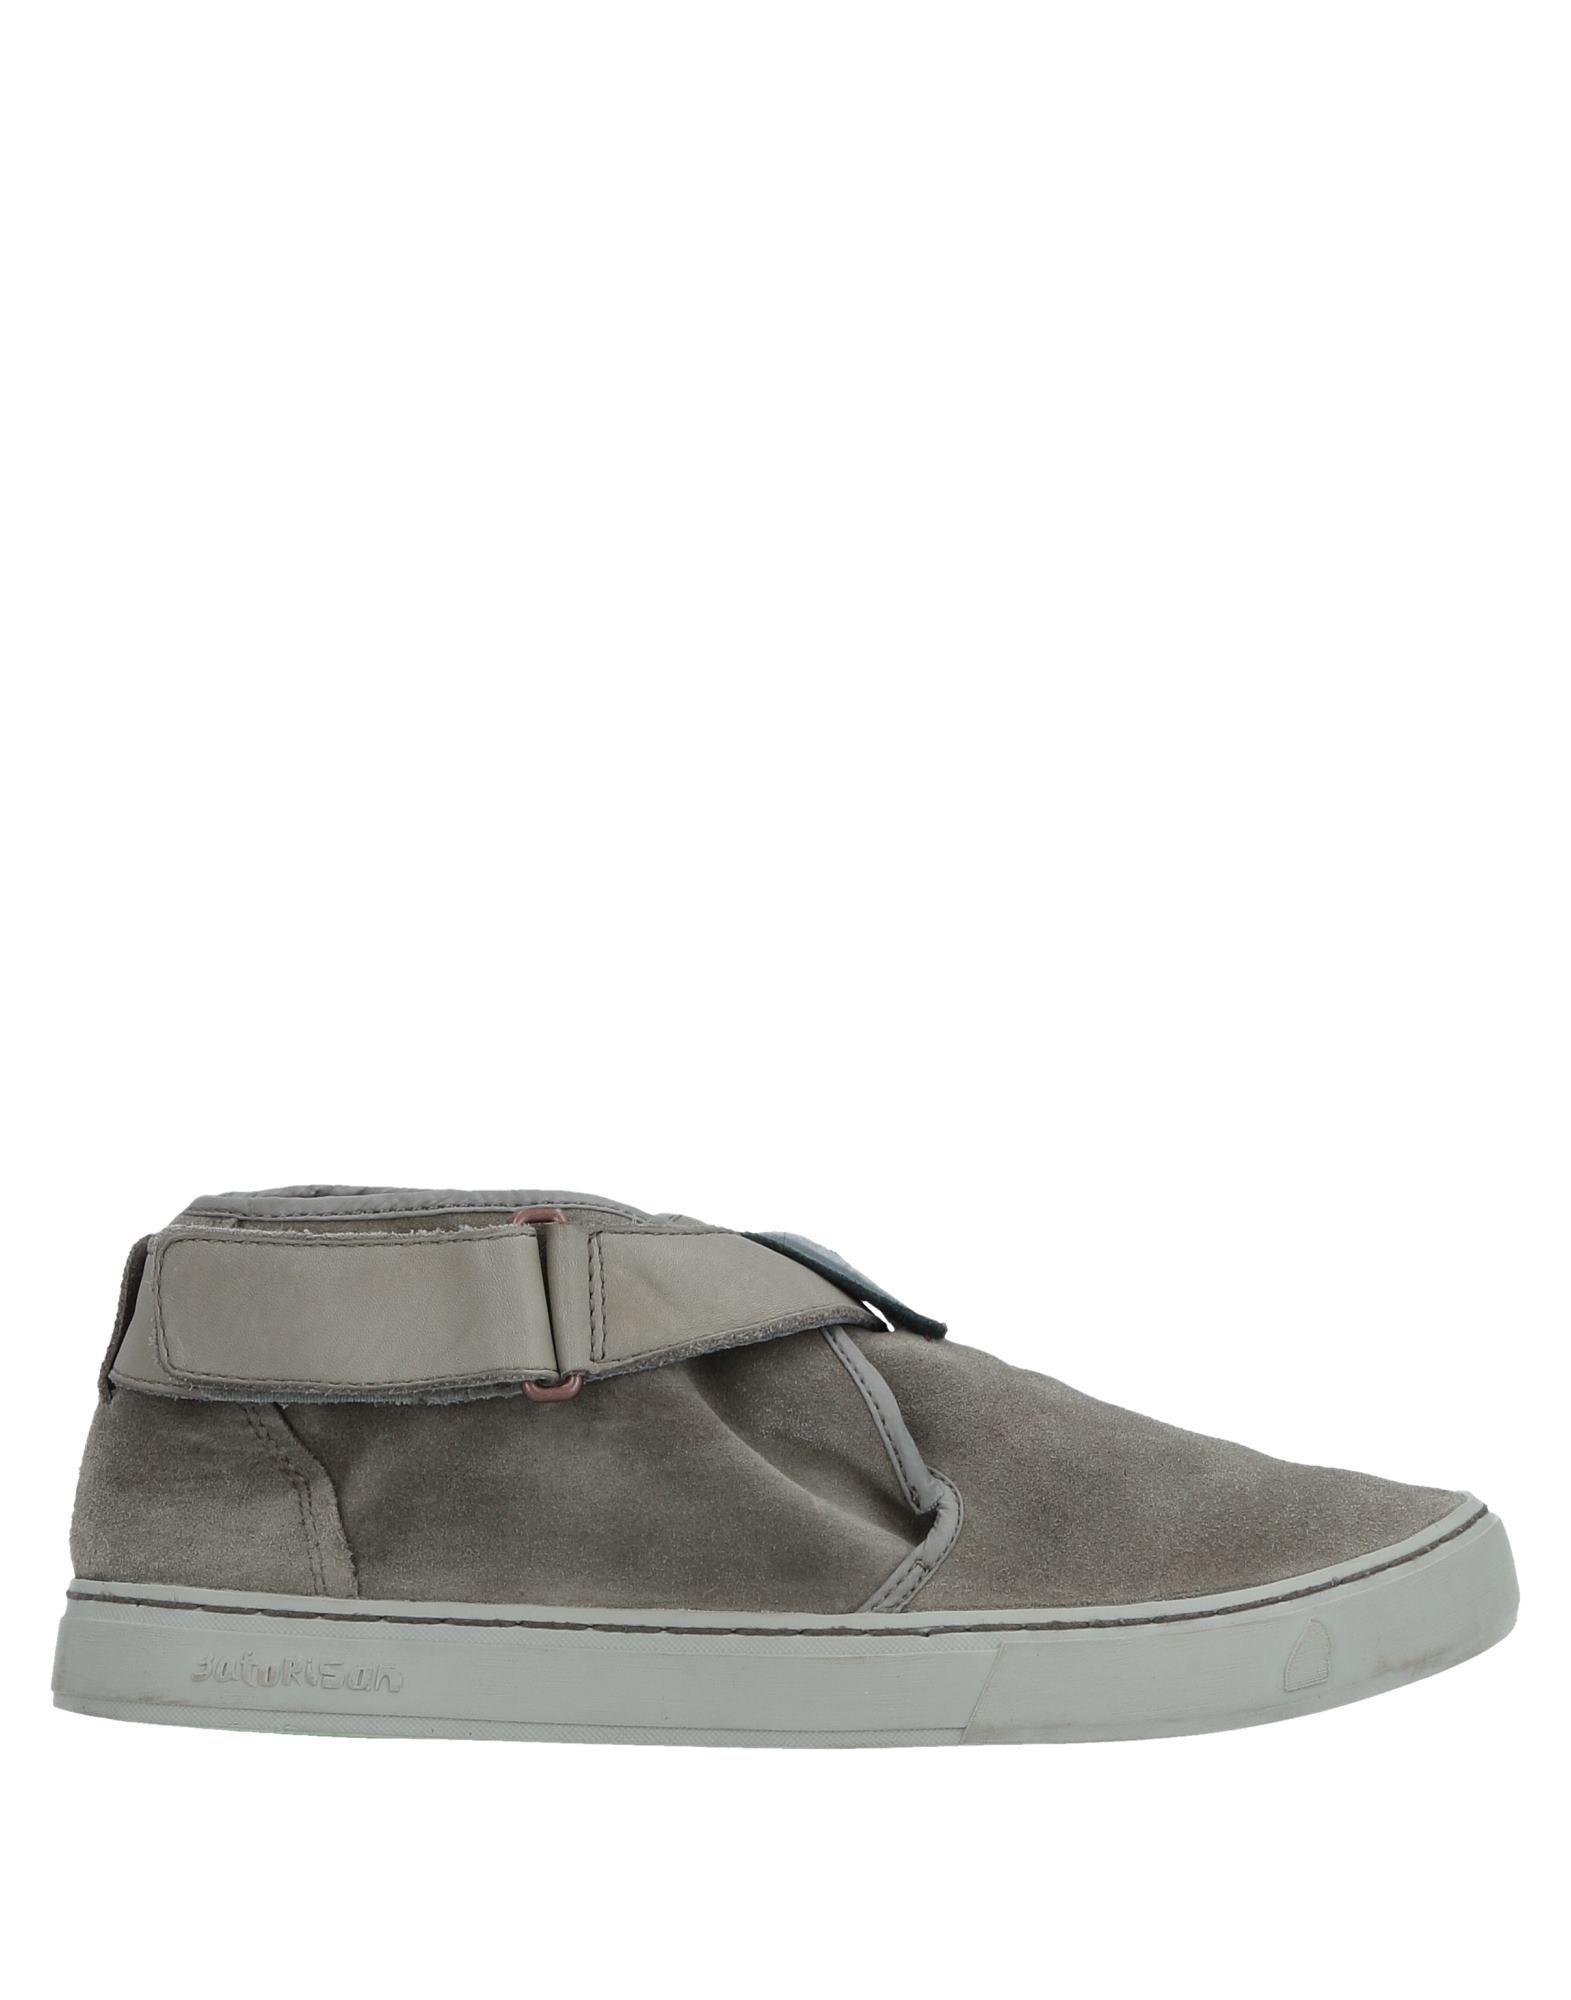 Rabatt echte Schuhe Satorisan Sneakers Herren  11523166DI